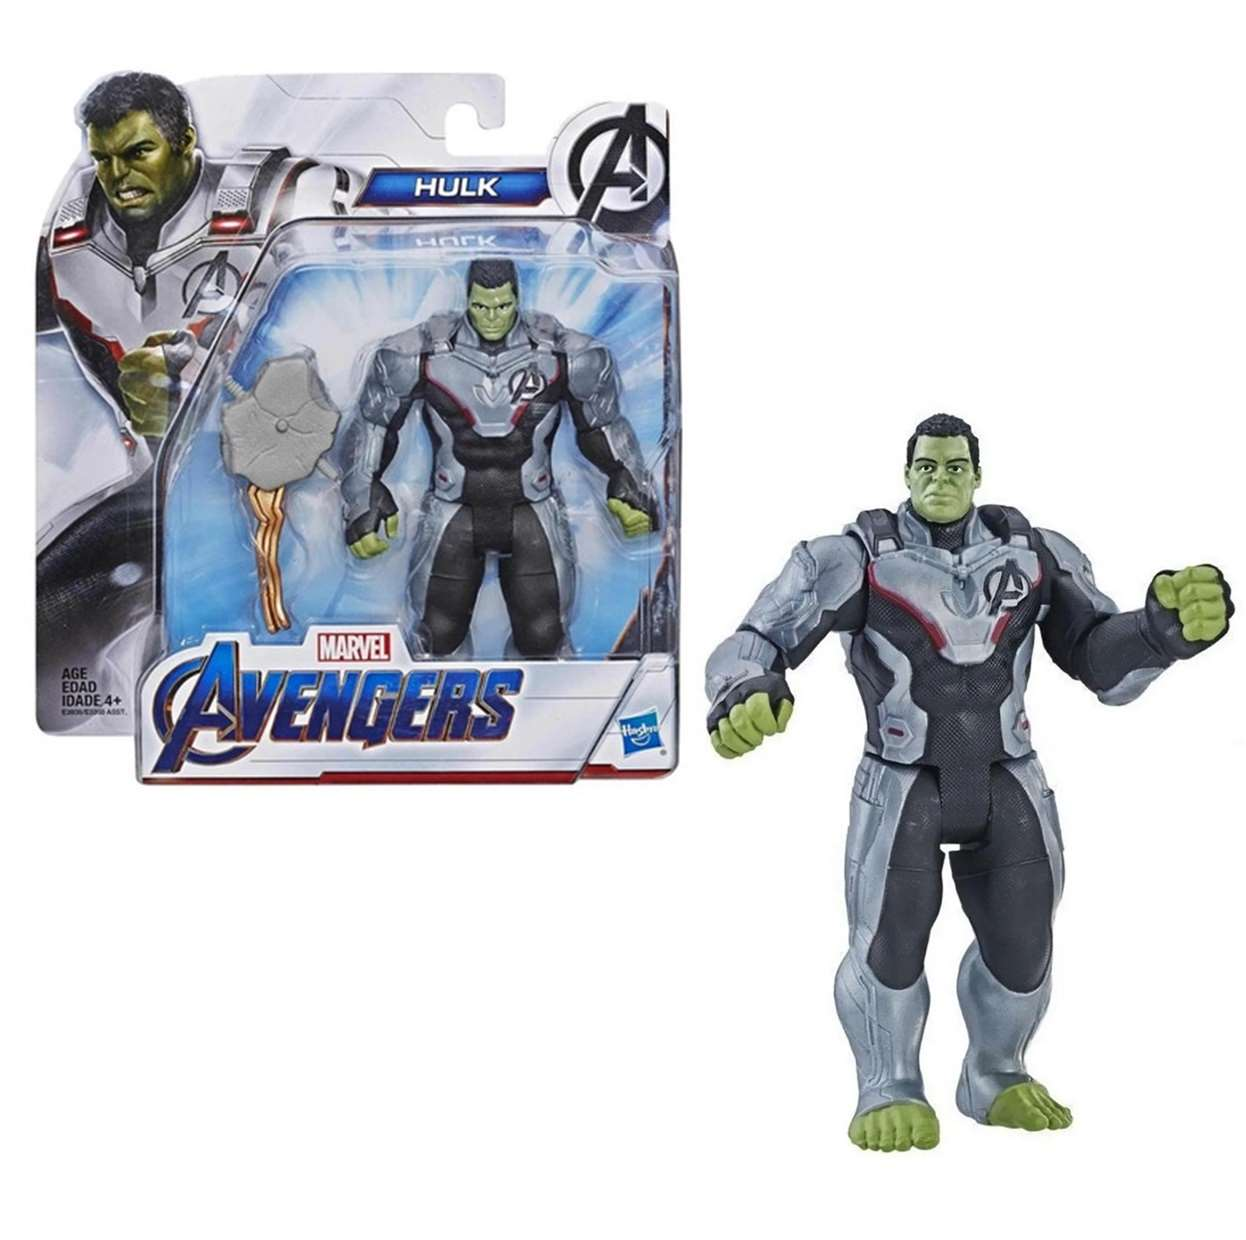 Hulk Traje Cuántico Figura Marvel Avengers End Game 6 PuLG